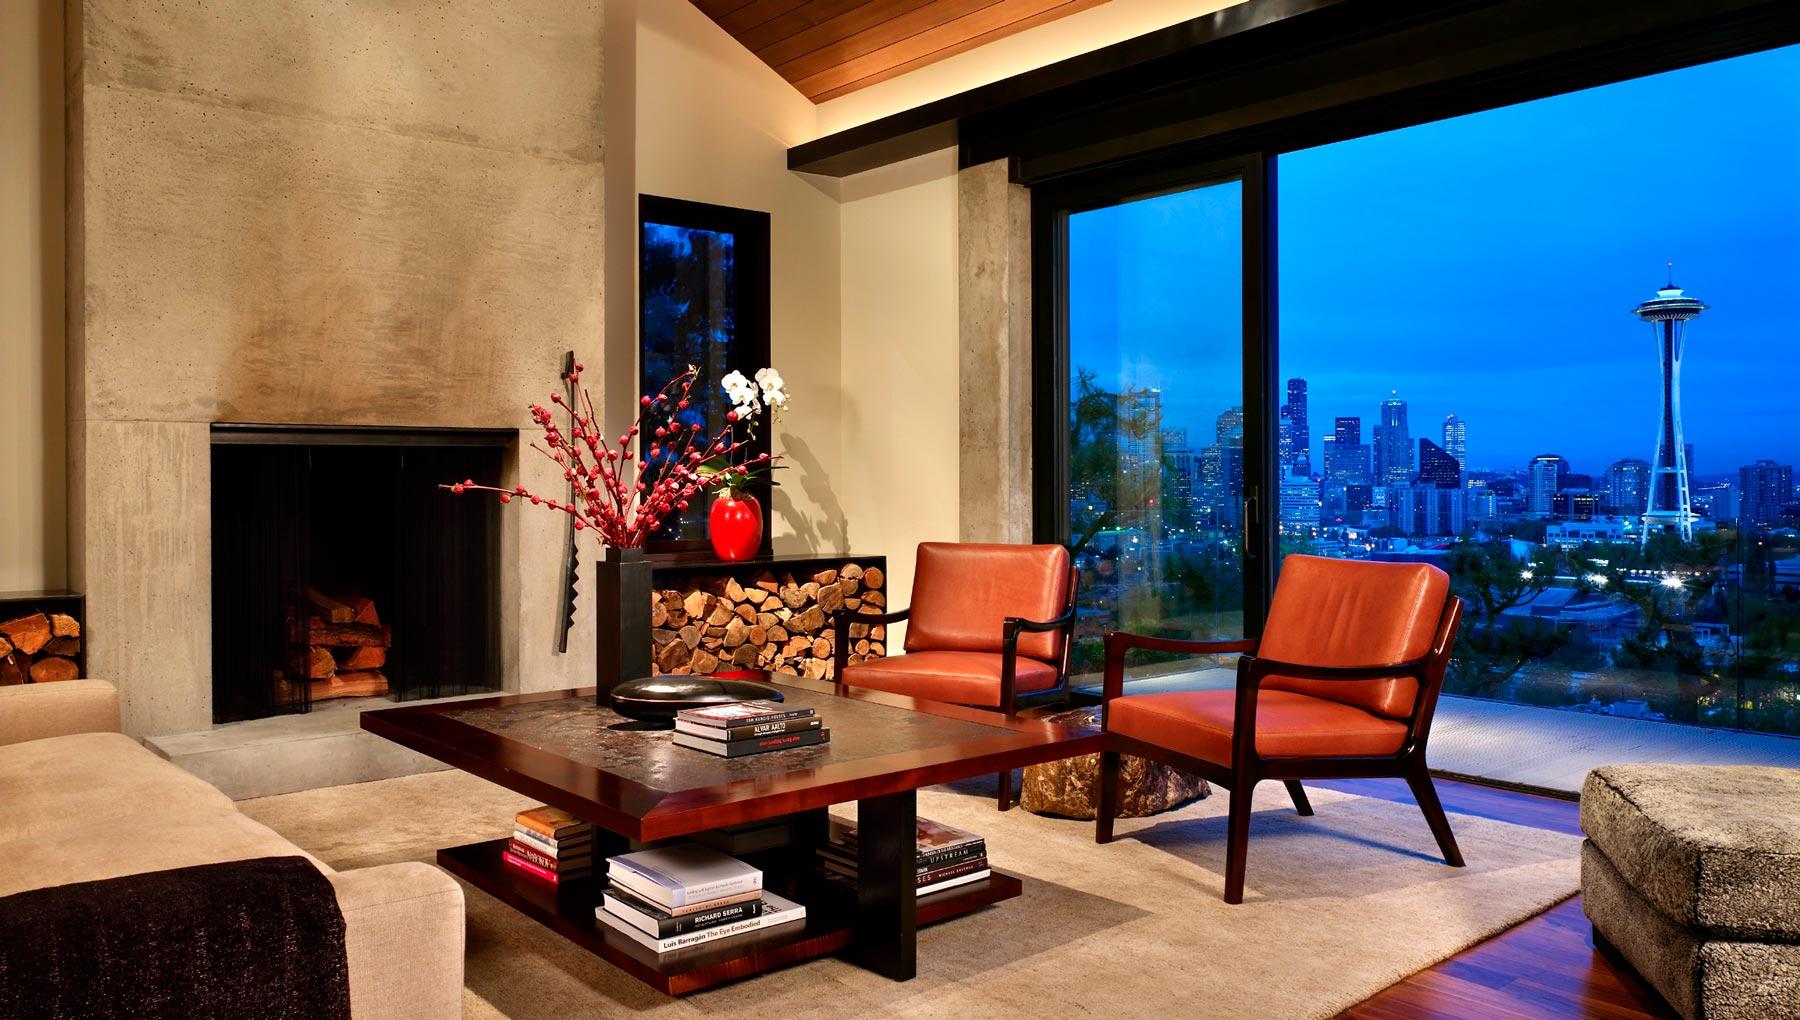 Ward Street Residence designed by Garrett Cord Werner